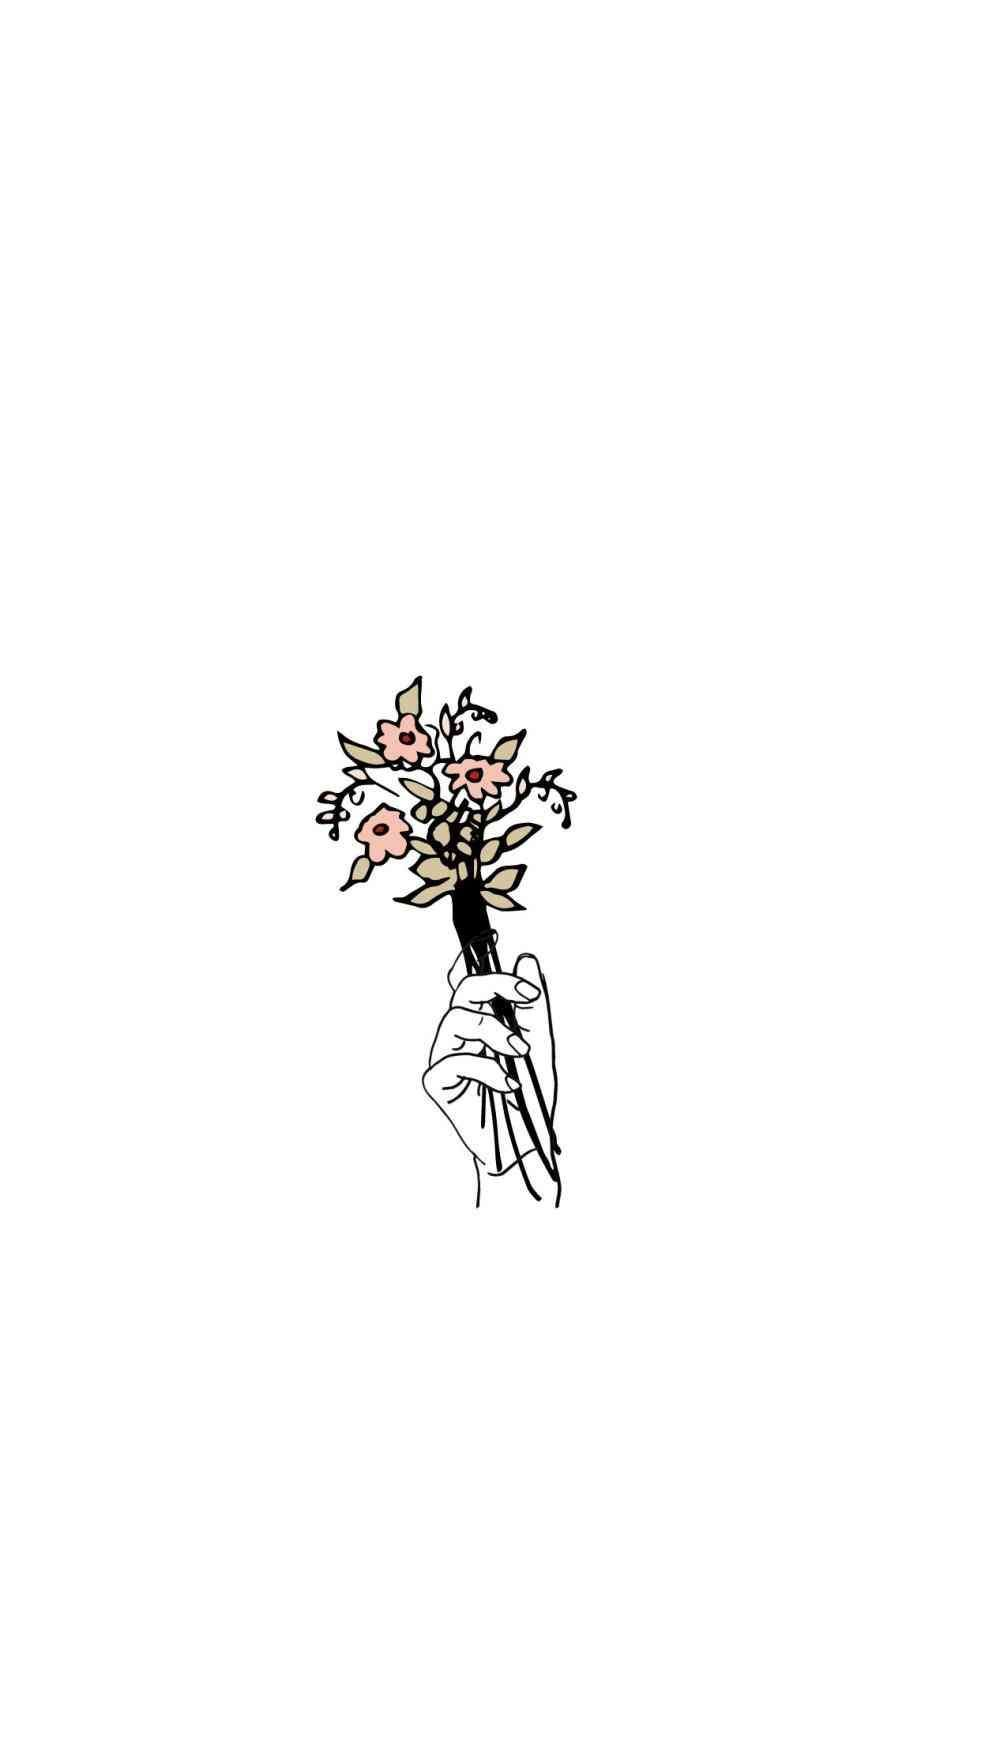 Simple Aesthetic Tumblr Wallpapers , Top Free Simple